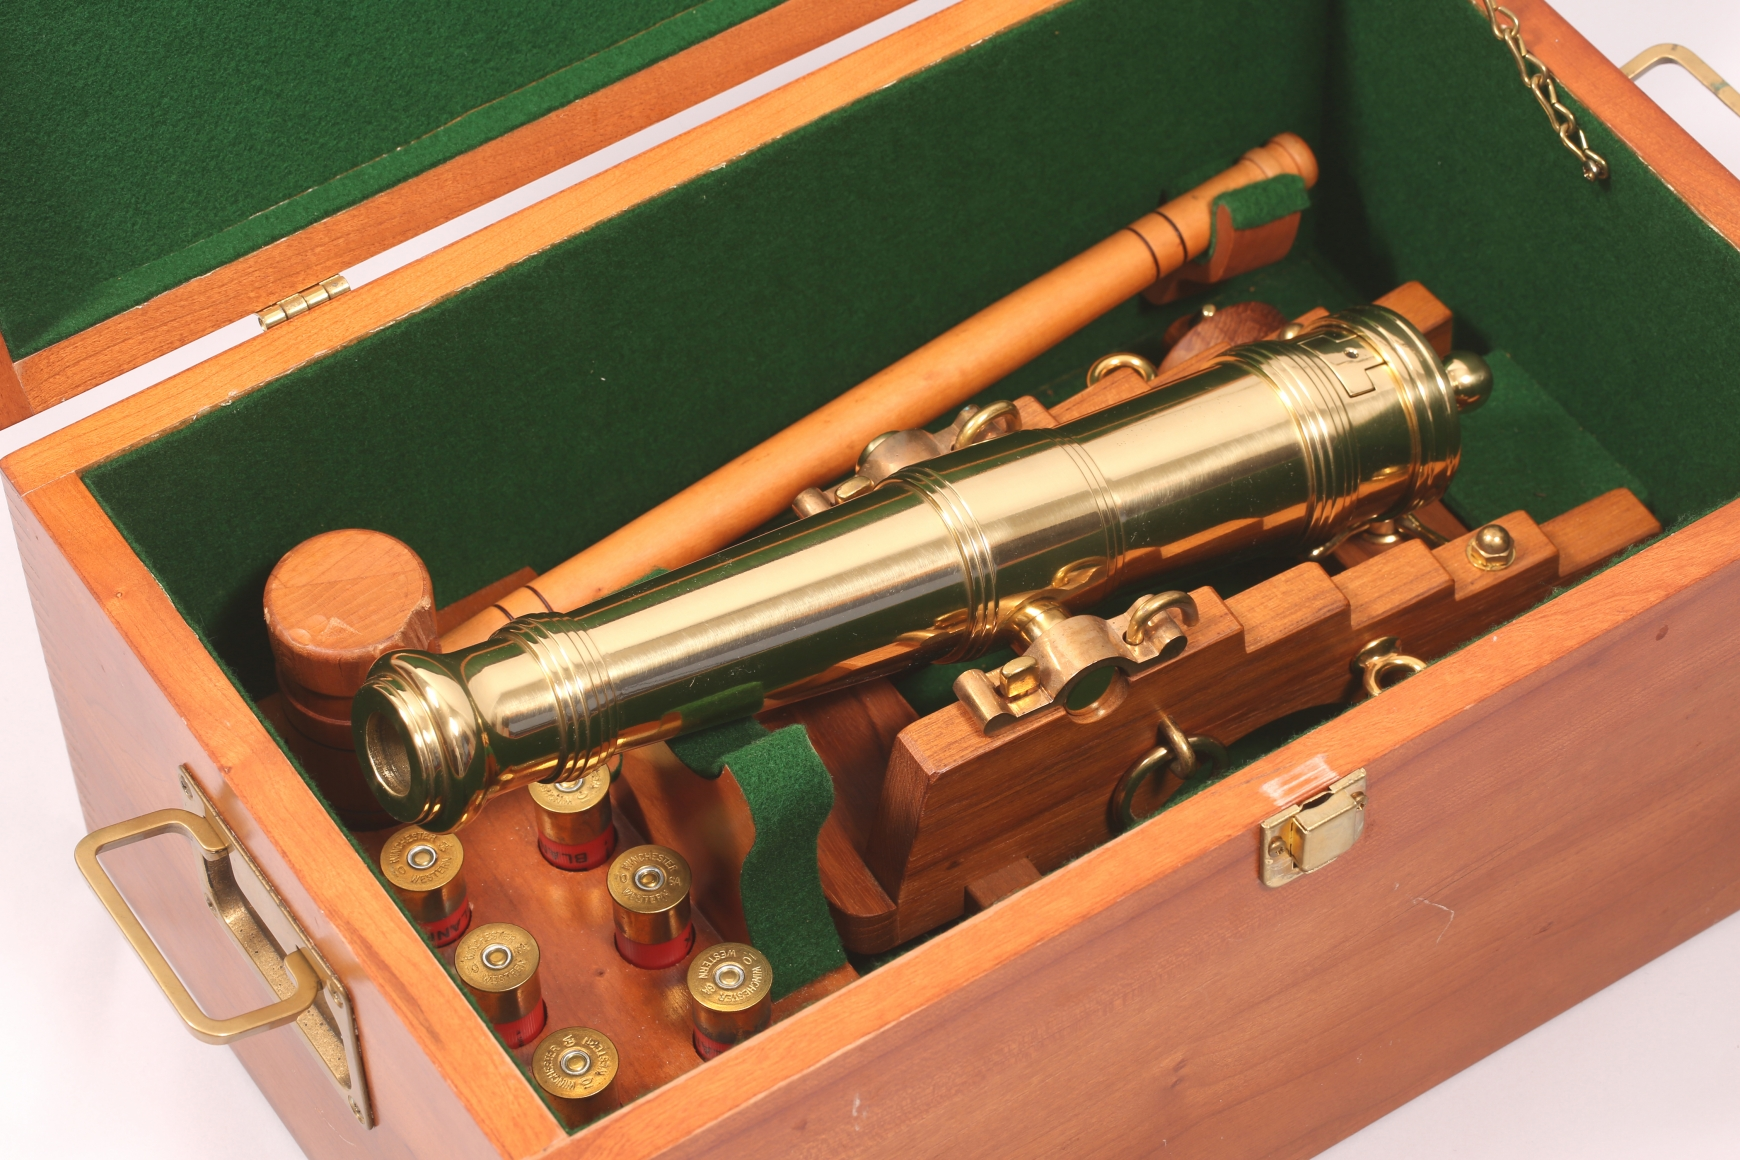 Herreshoff 10GA Saluting Cannon by Bellmore & Johnson - Inventory